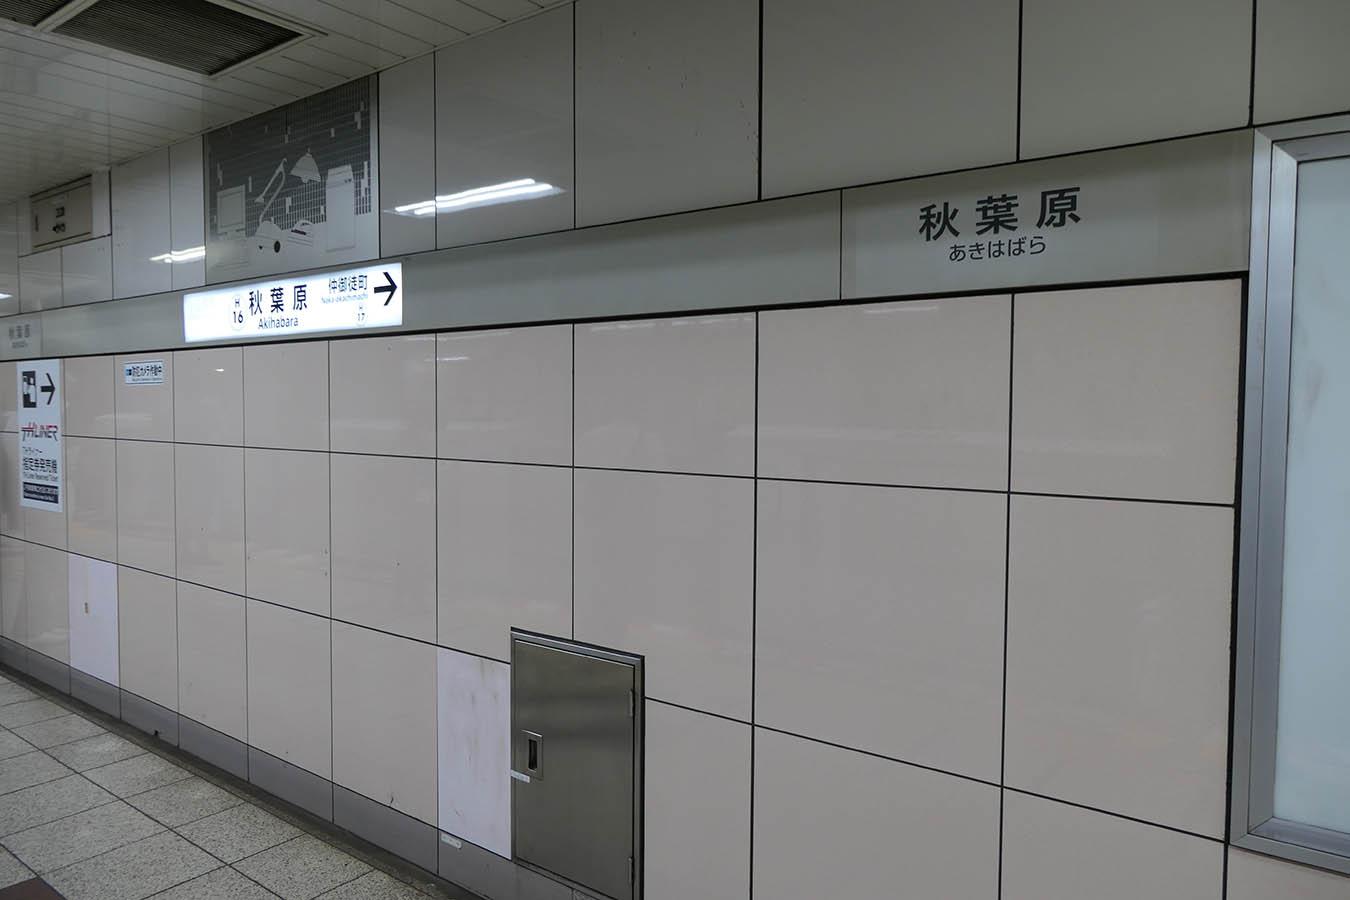 H16_photo01.jpg